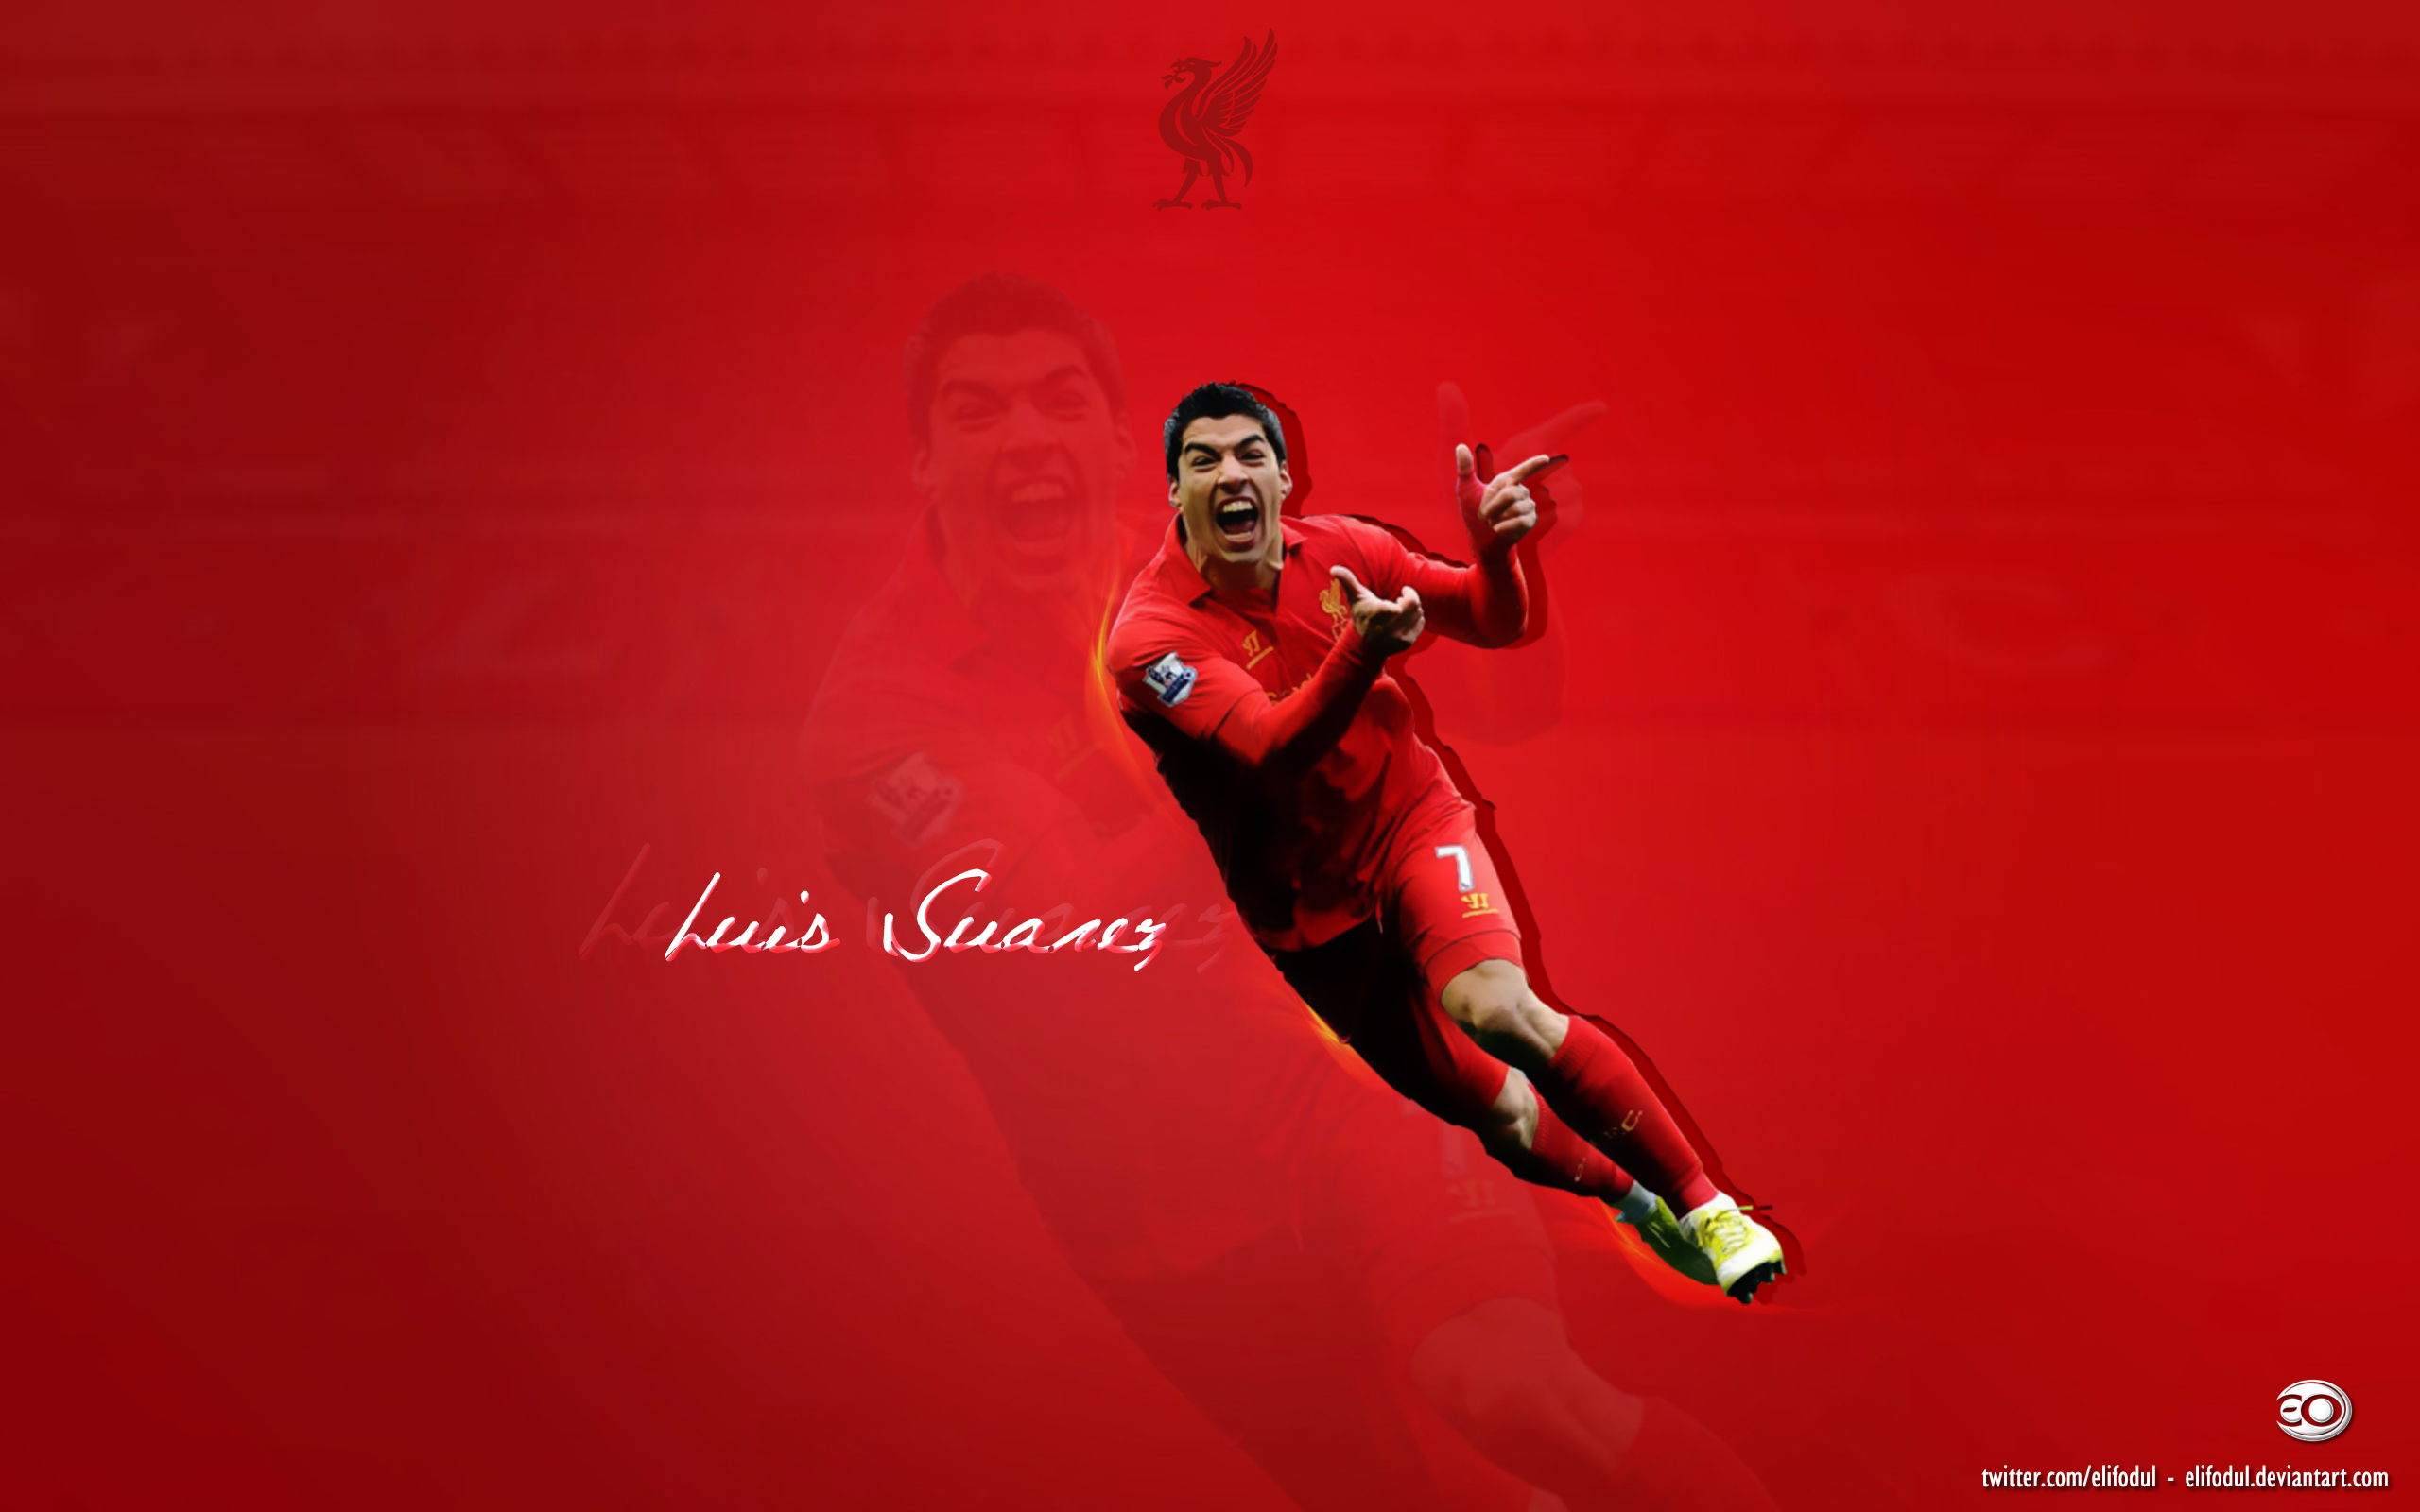 Luis Suarez Wallpapers   Football Wallpaper HD Football 2560x1600